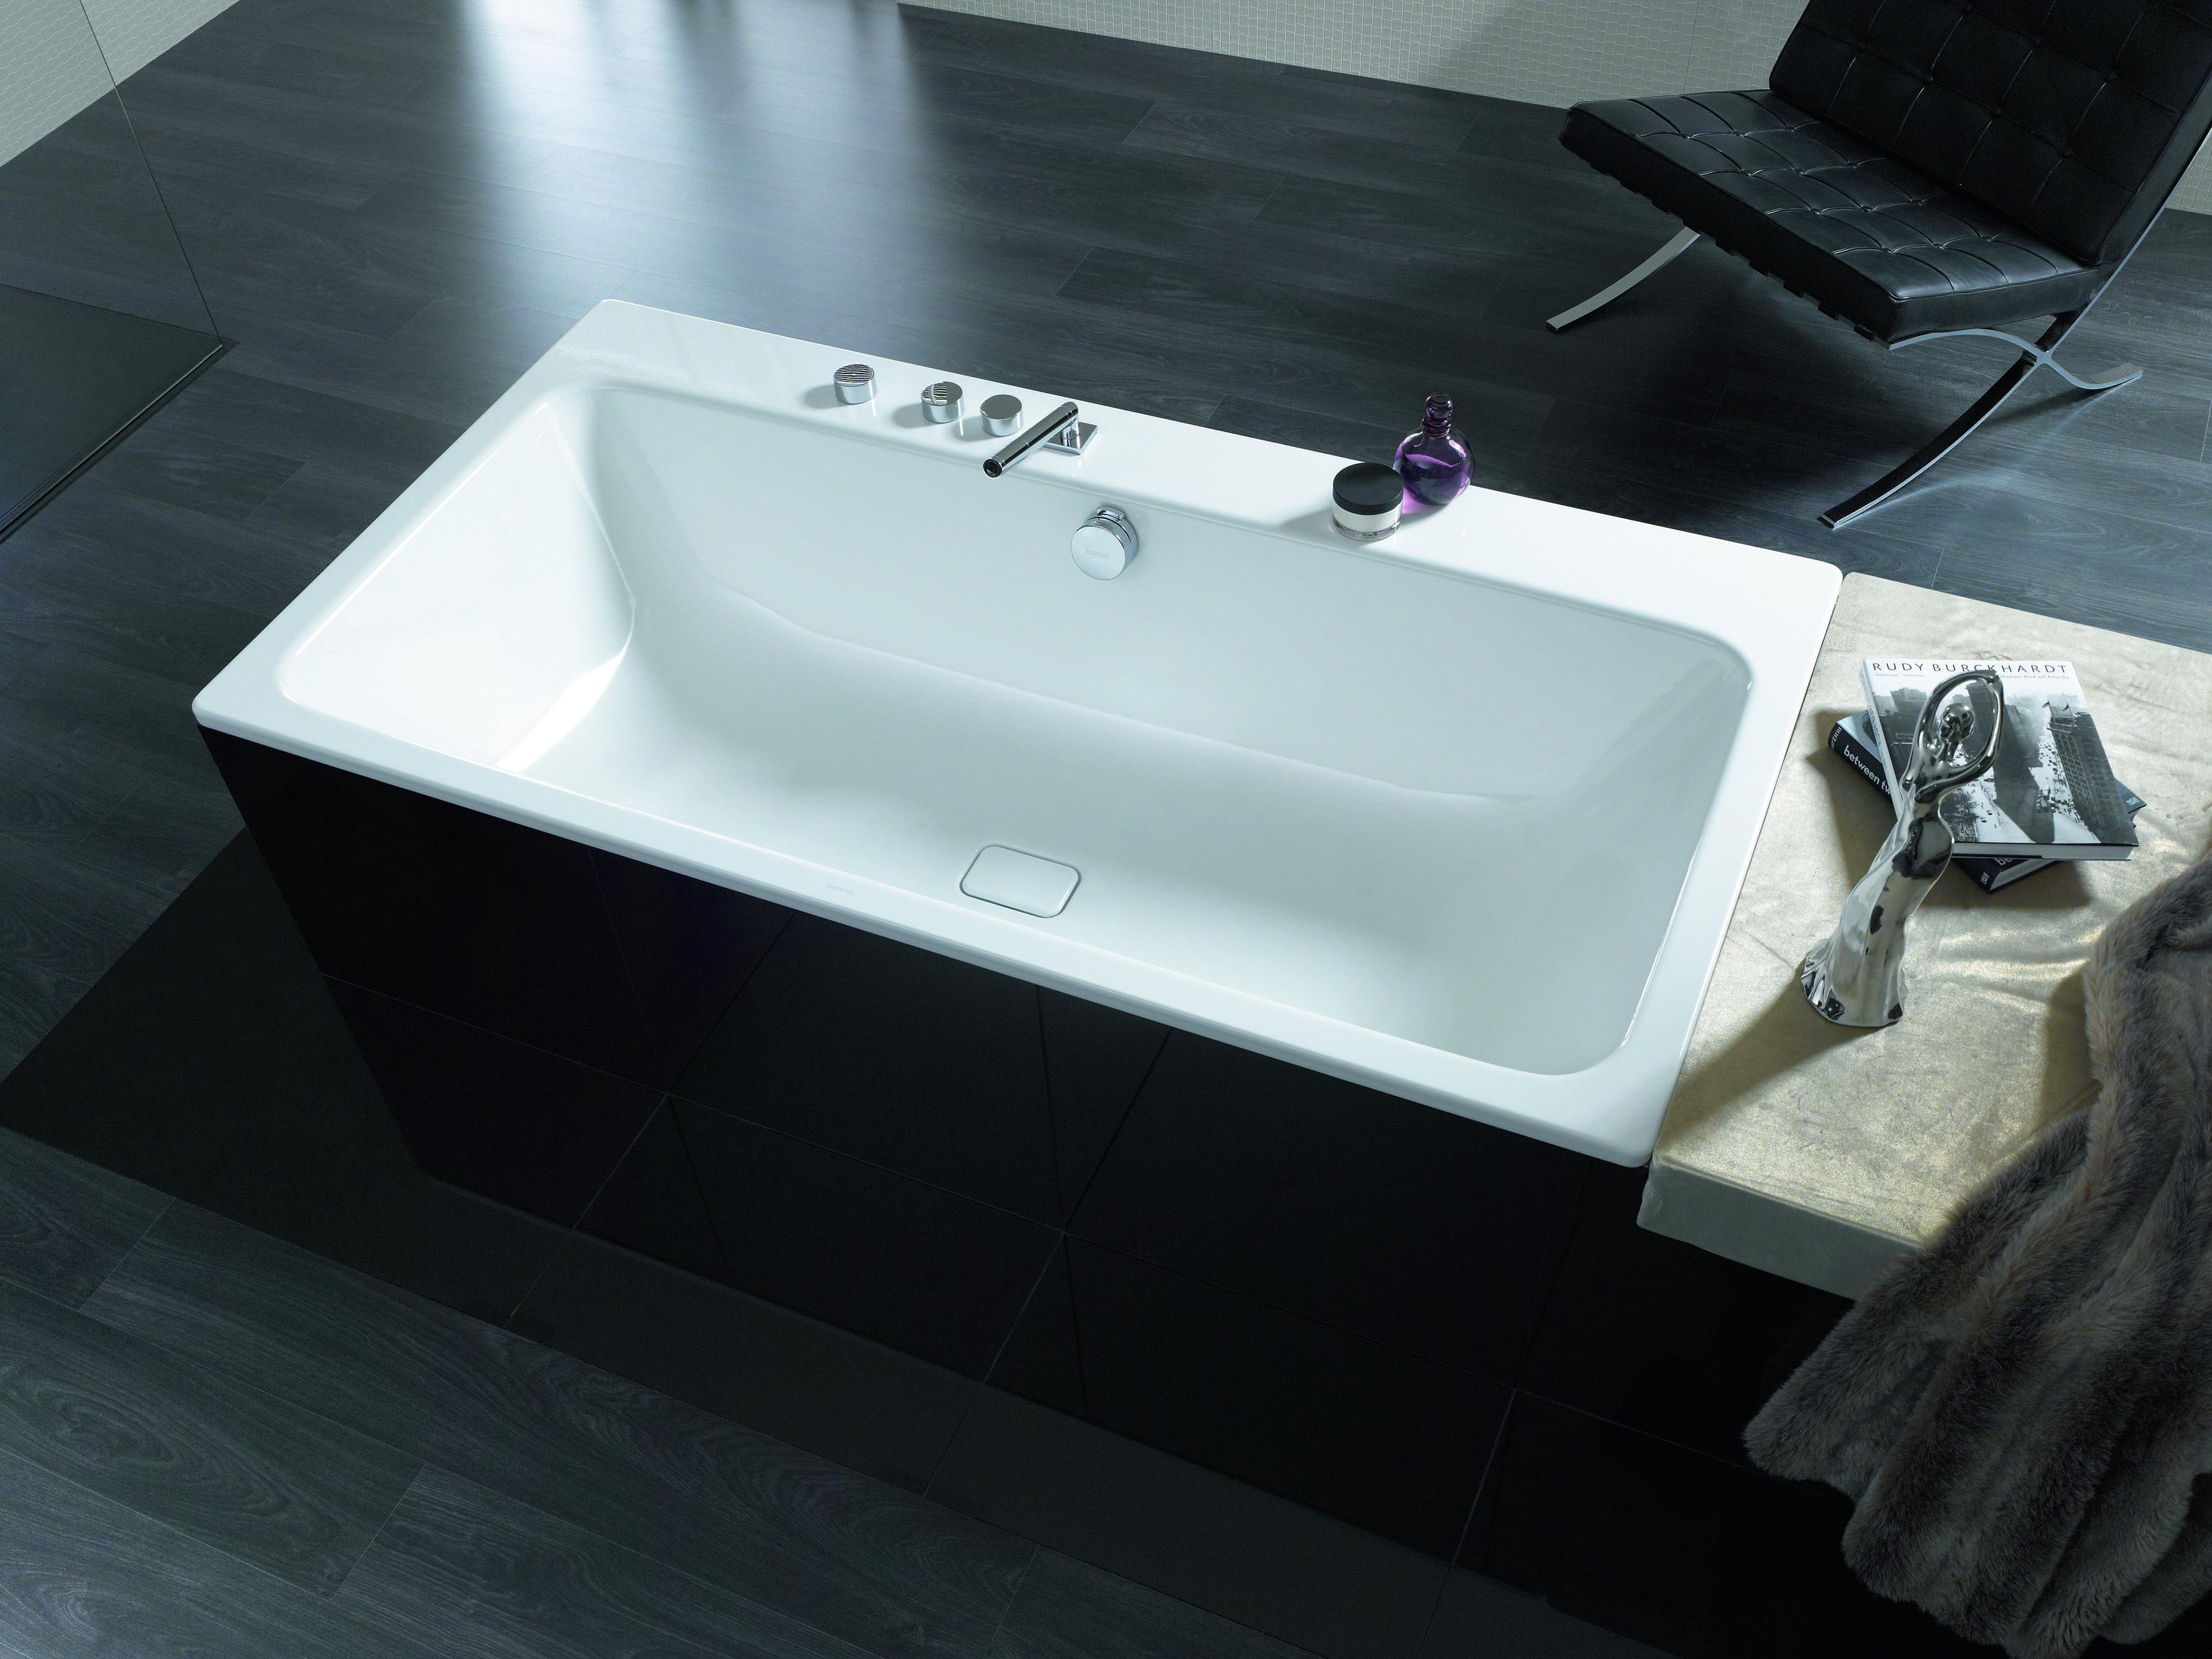 Vasca Da Bagno Kaldewei Prezzi : Kaldewei asymmetric duo large broad bathtub arch bathroom